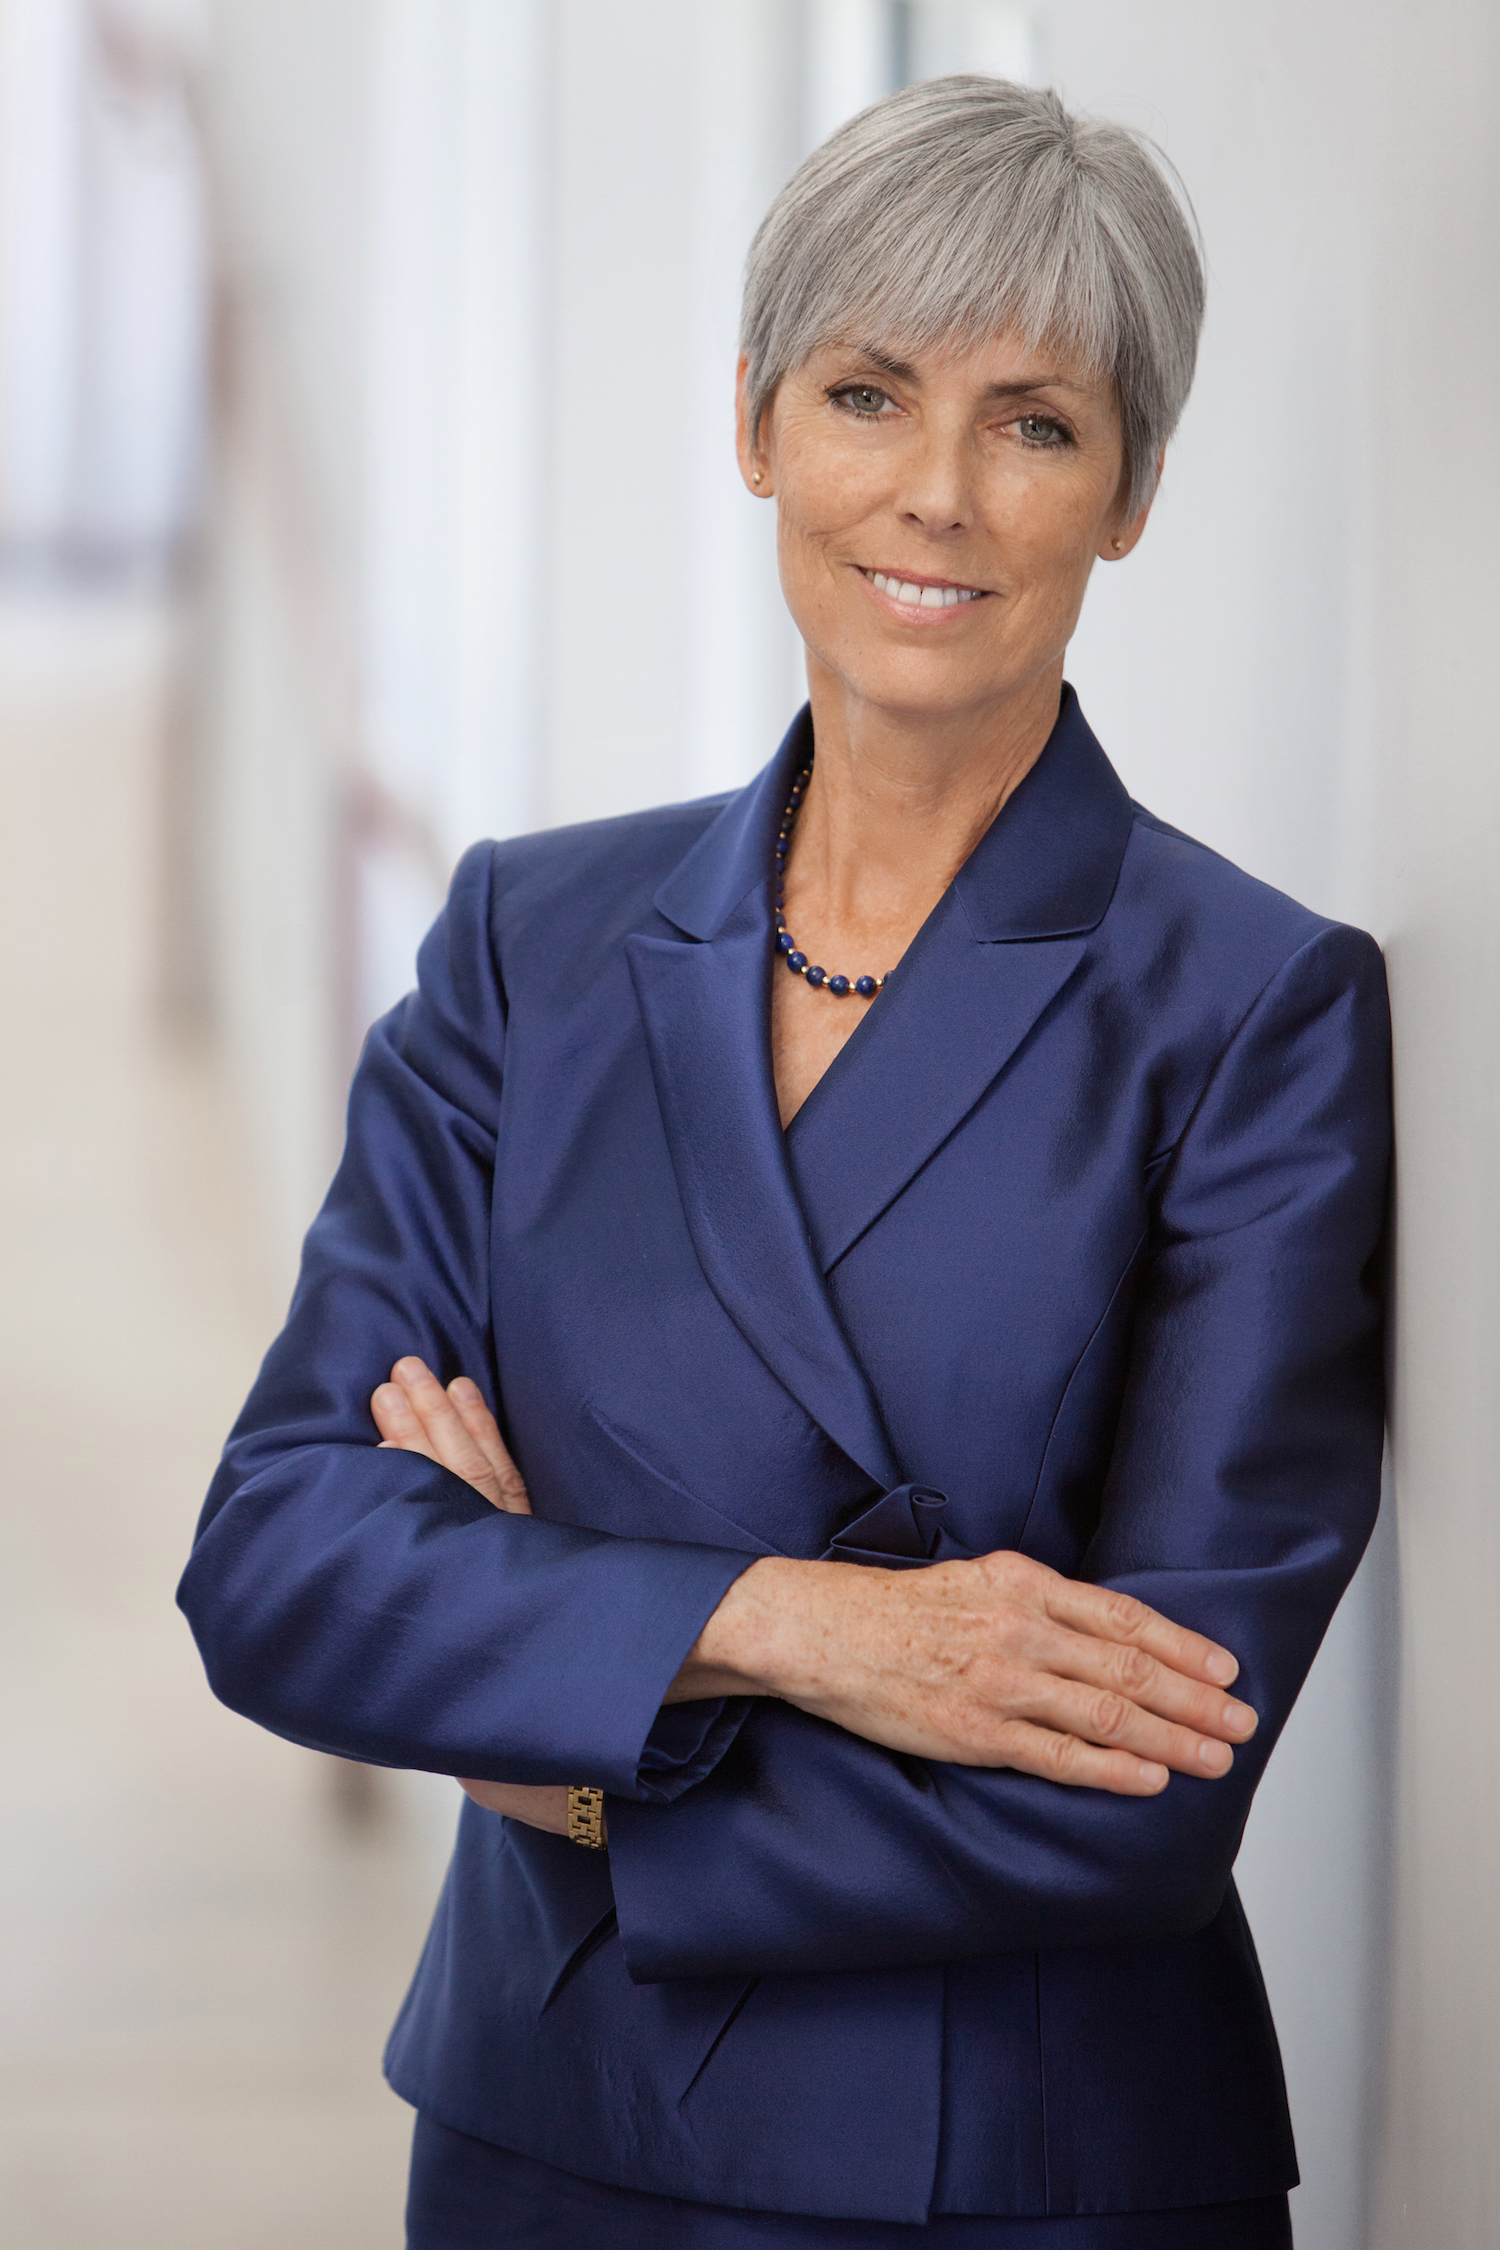 Roberta Benson